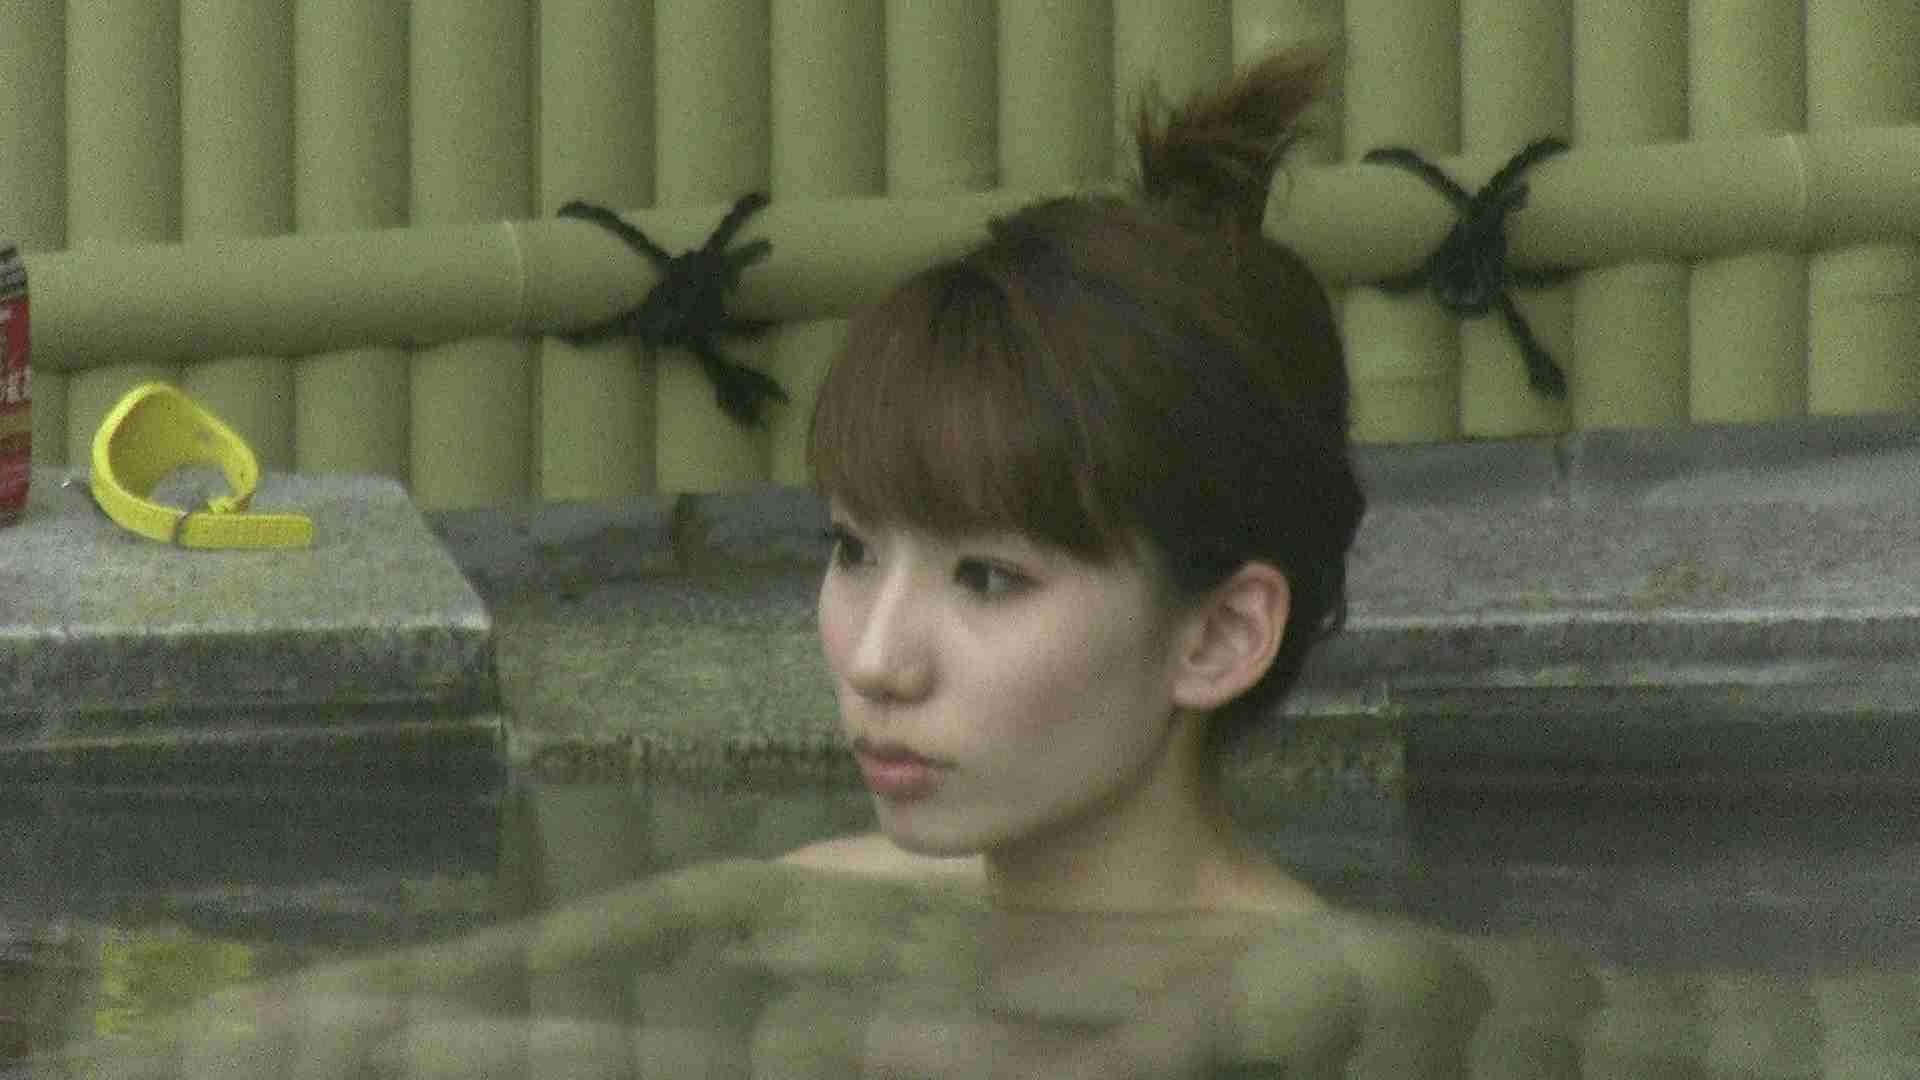 Aquaな露天風呂Vol.208 HなOL   盗撮  101pic 33